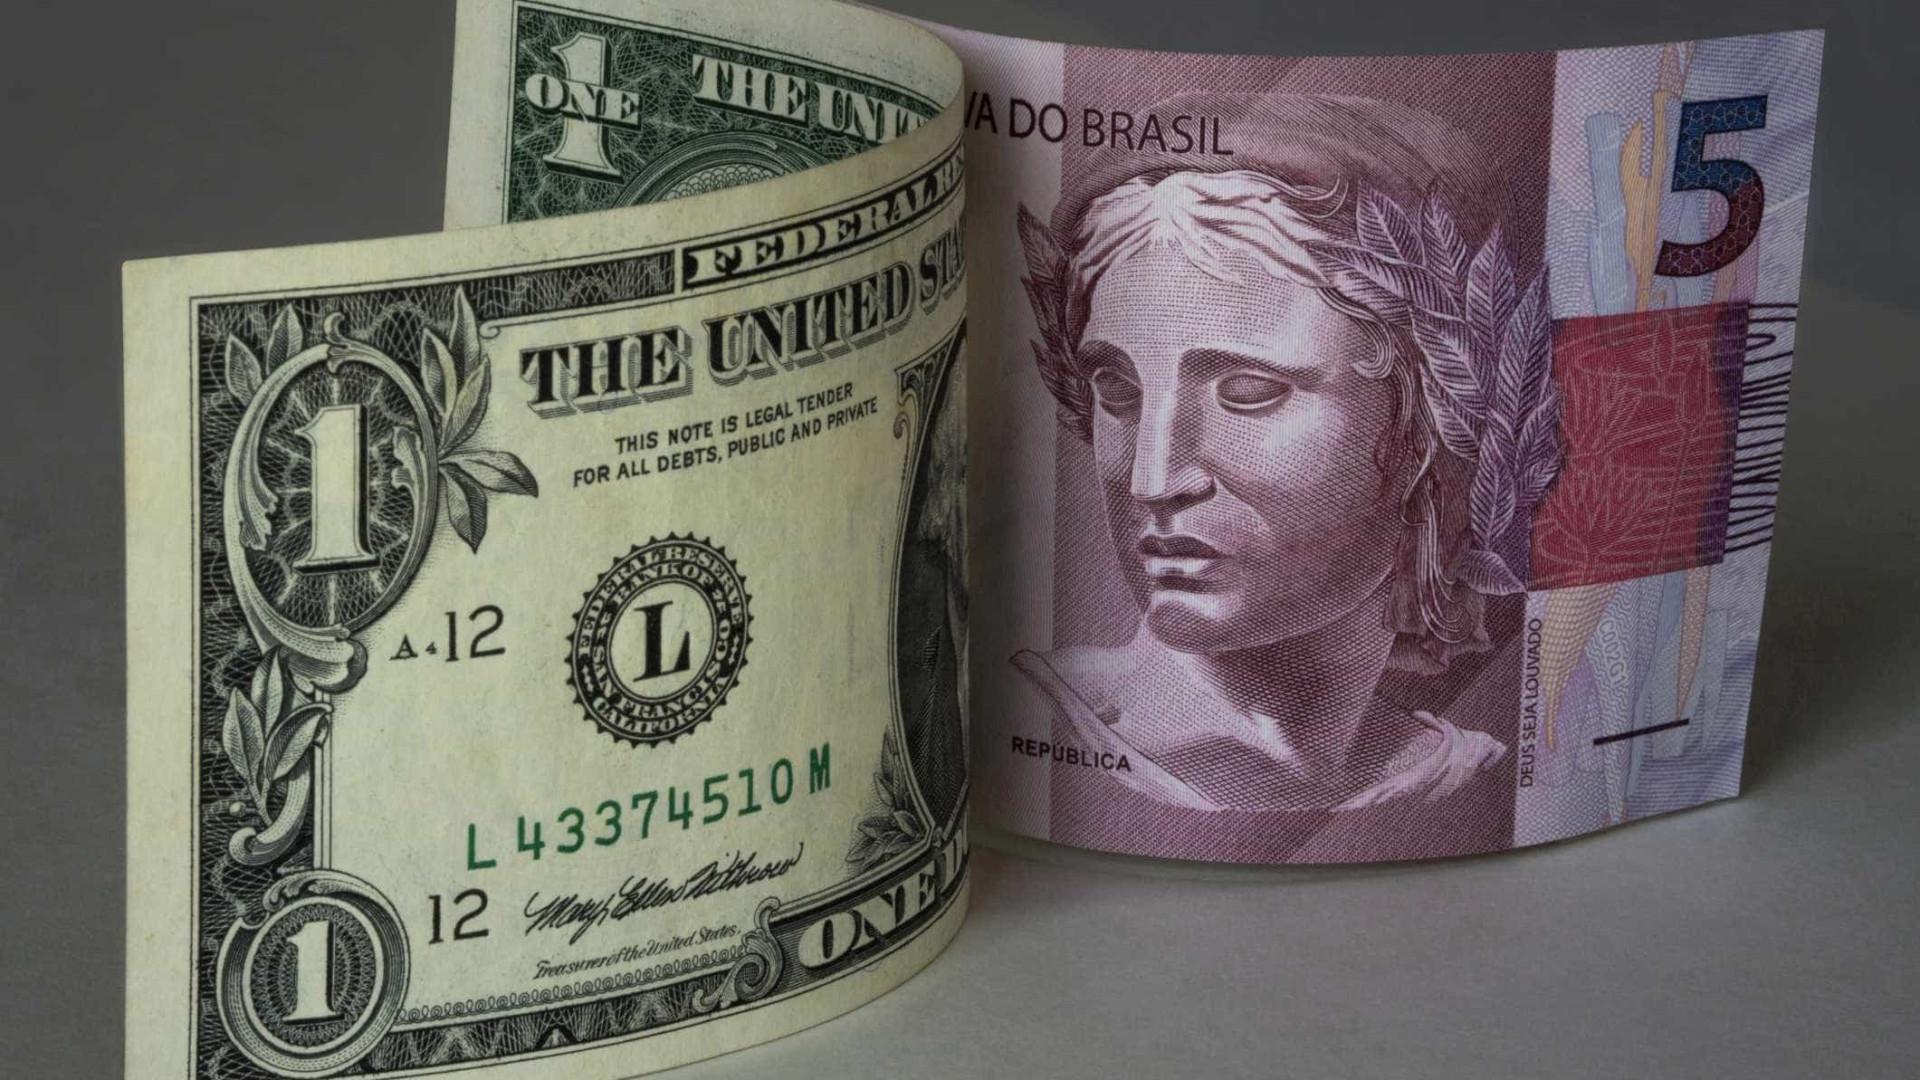 Bolsa fecha em baixa; dólar sobe a R$ 3,14